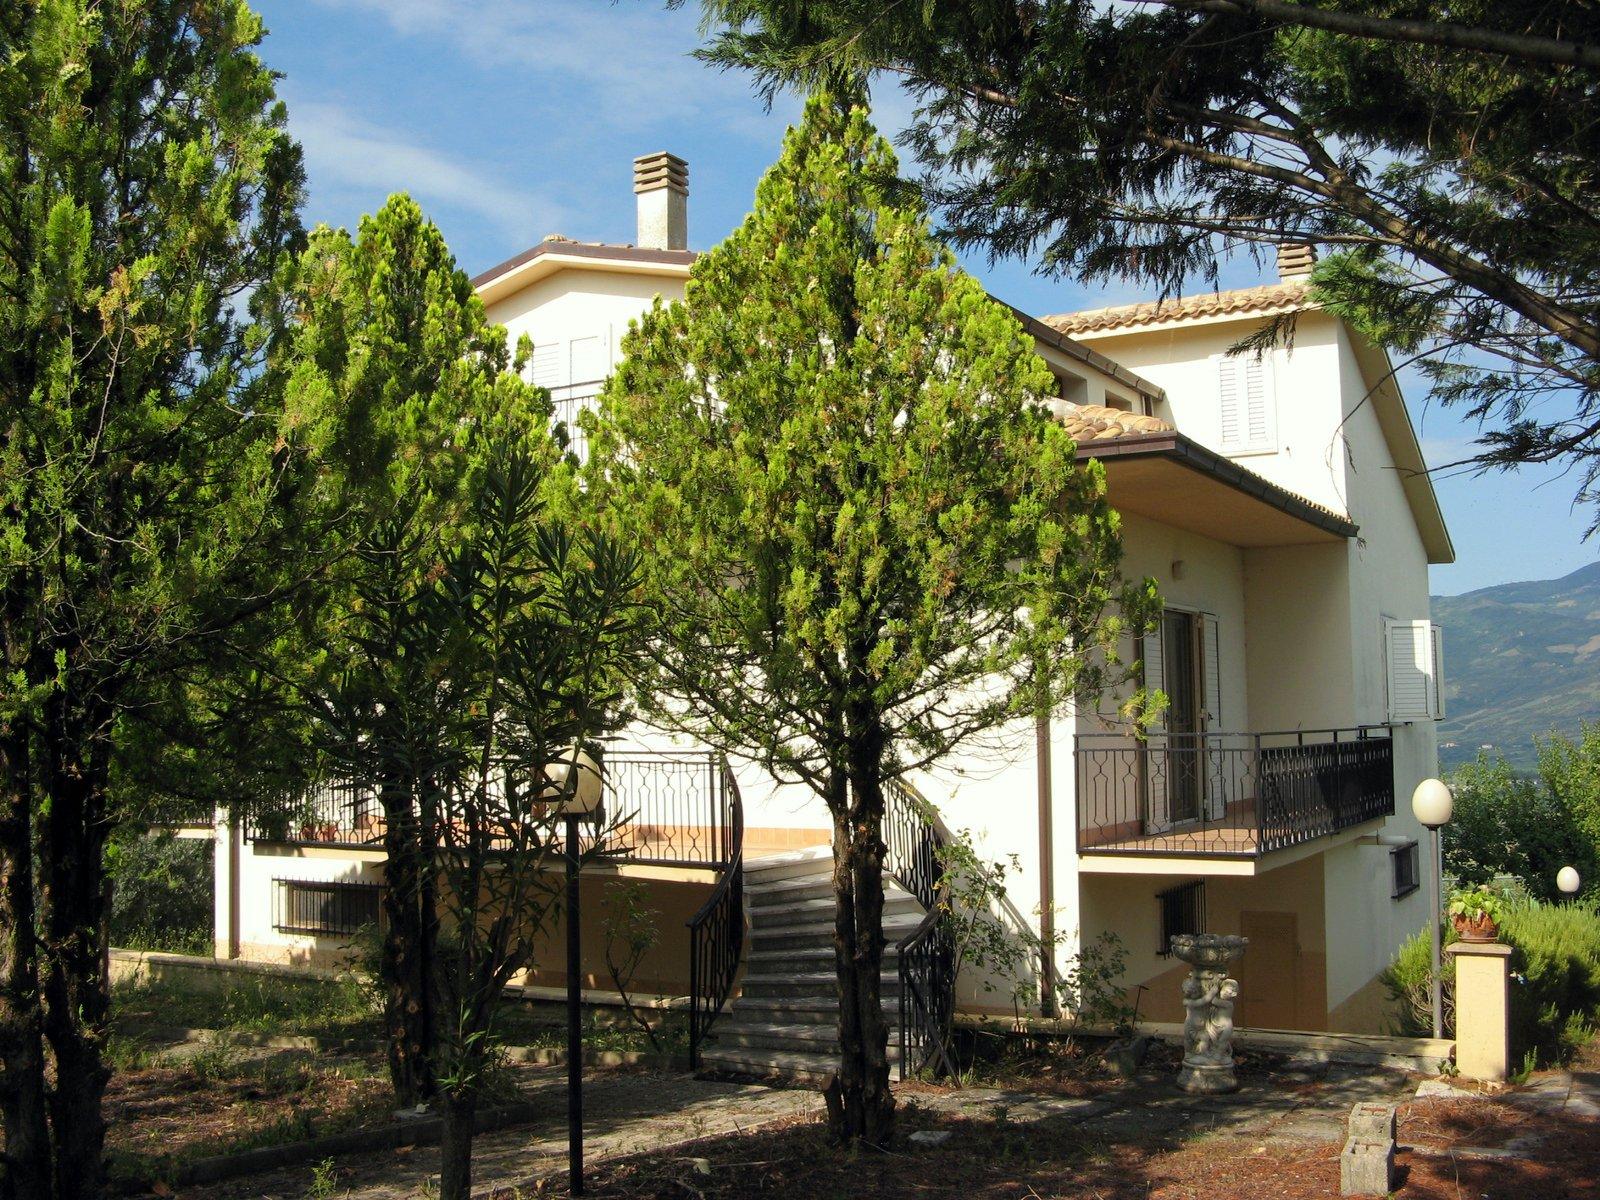 bolognano_housesofitaly_1 IMG_8707a.JPG